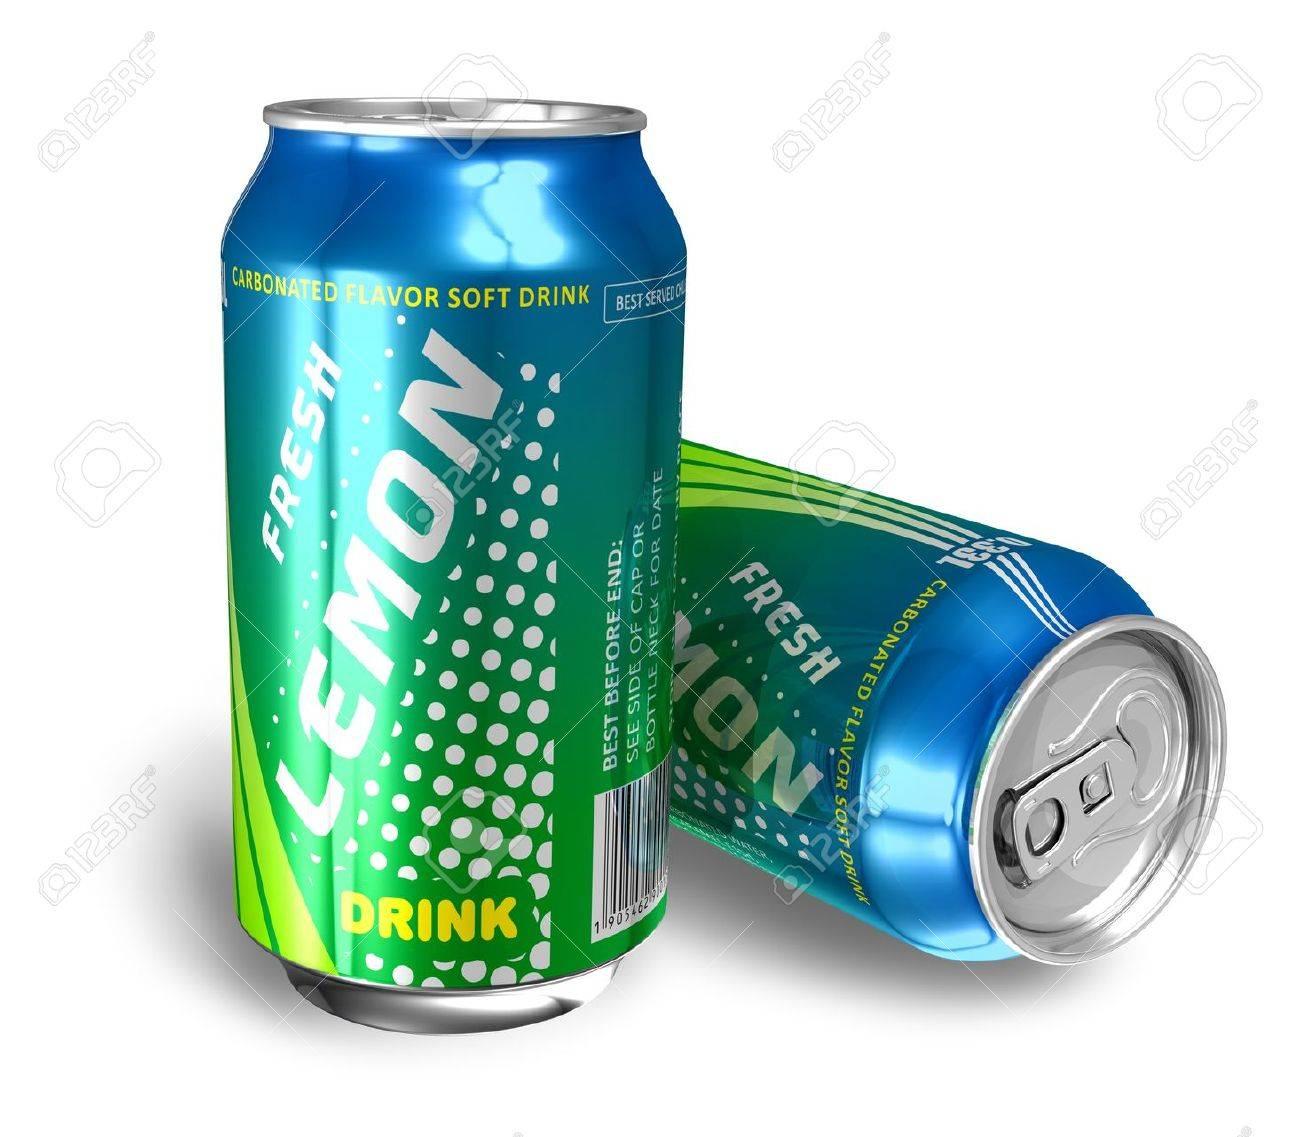 Lemon soda drinks in metal cans Stock Photo - 9162212